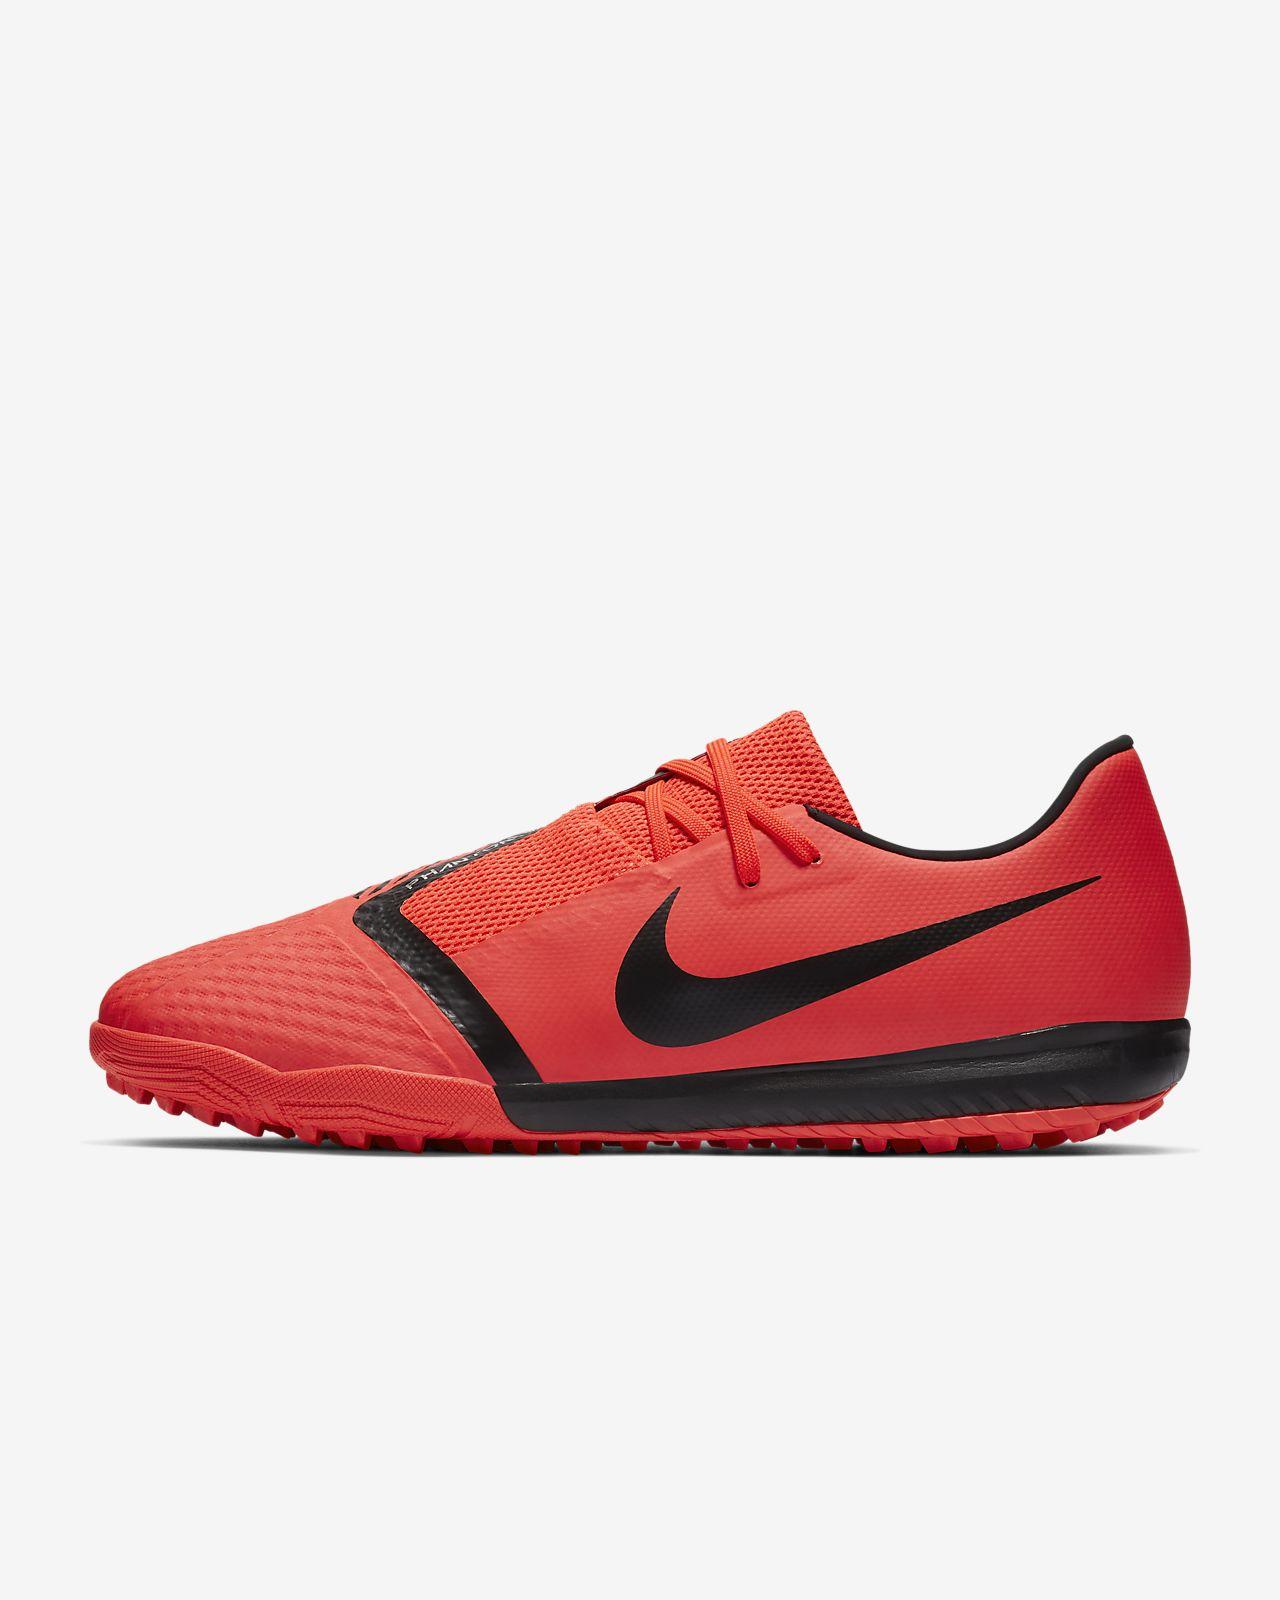 Nike PhantomVNM Academy TF Game Over 人工短草草皮英式足球鞋